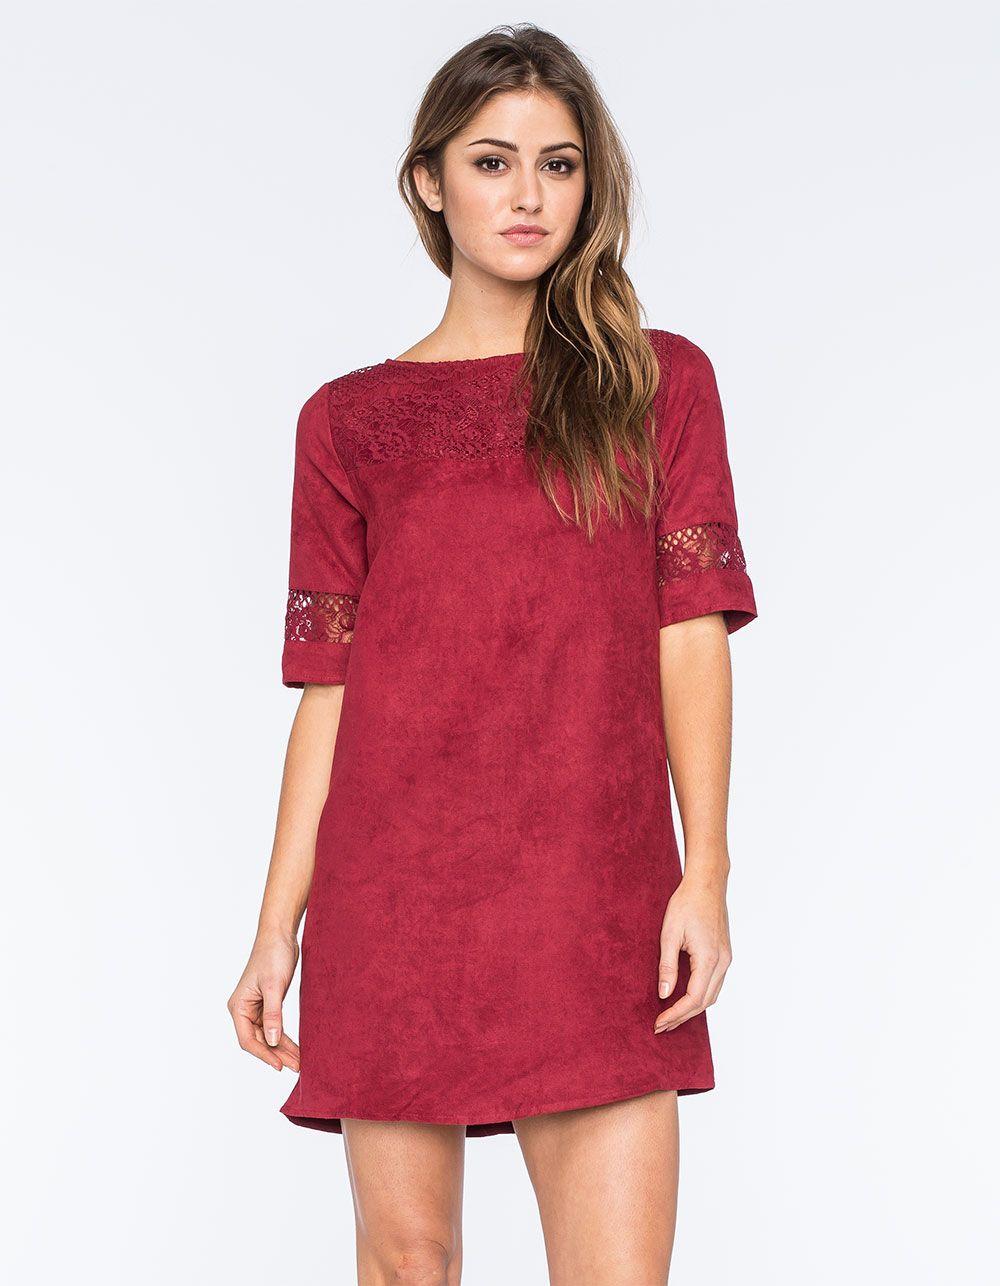 FIRE Lace Suede Shift Dress 268105320 | Fall 2015